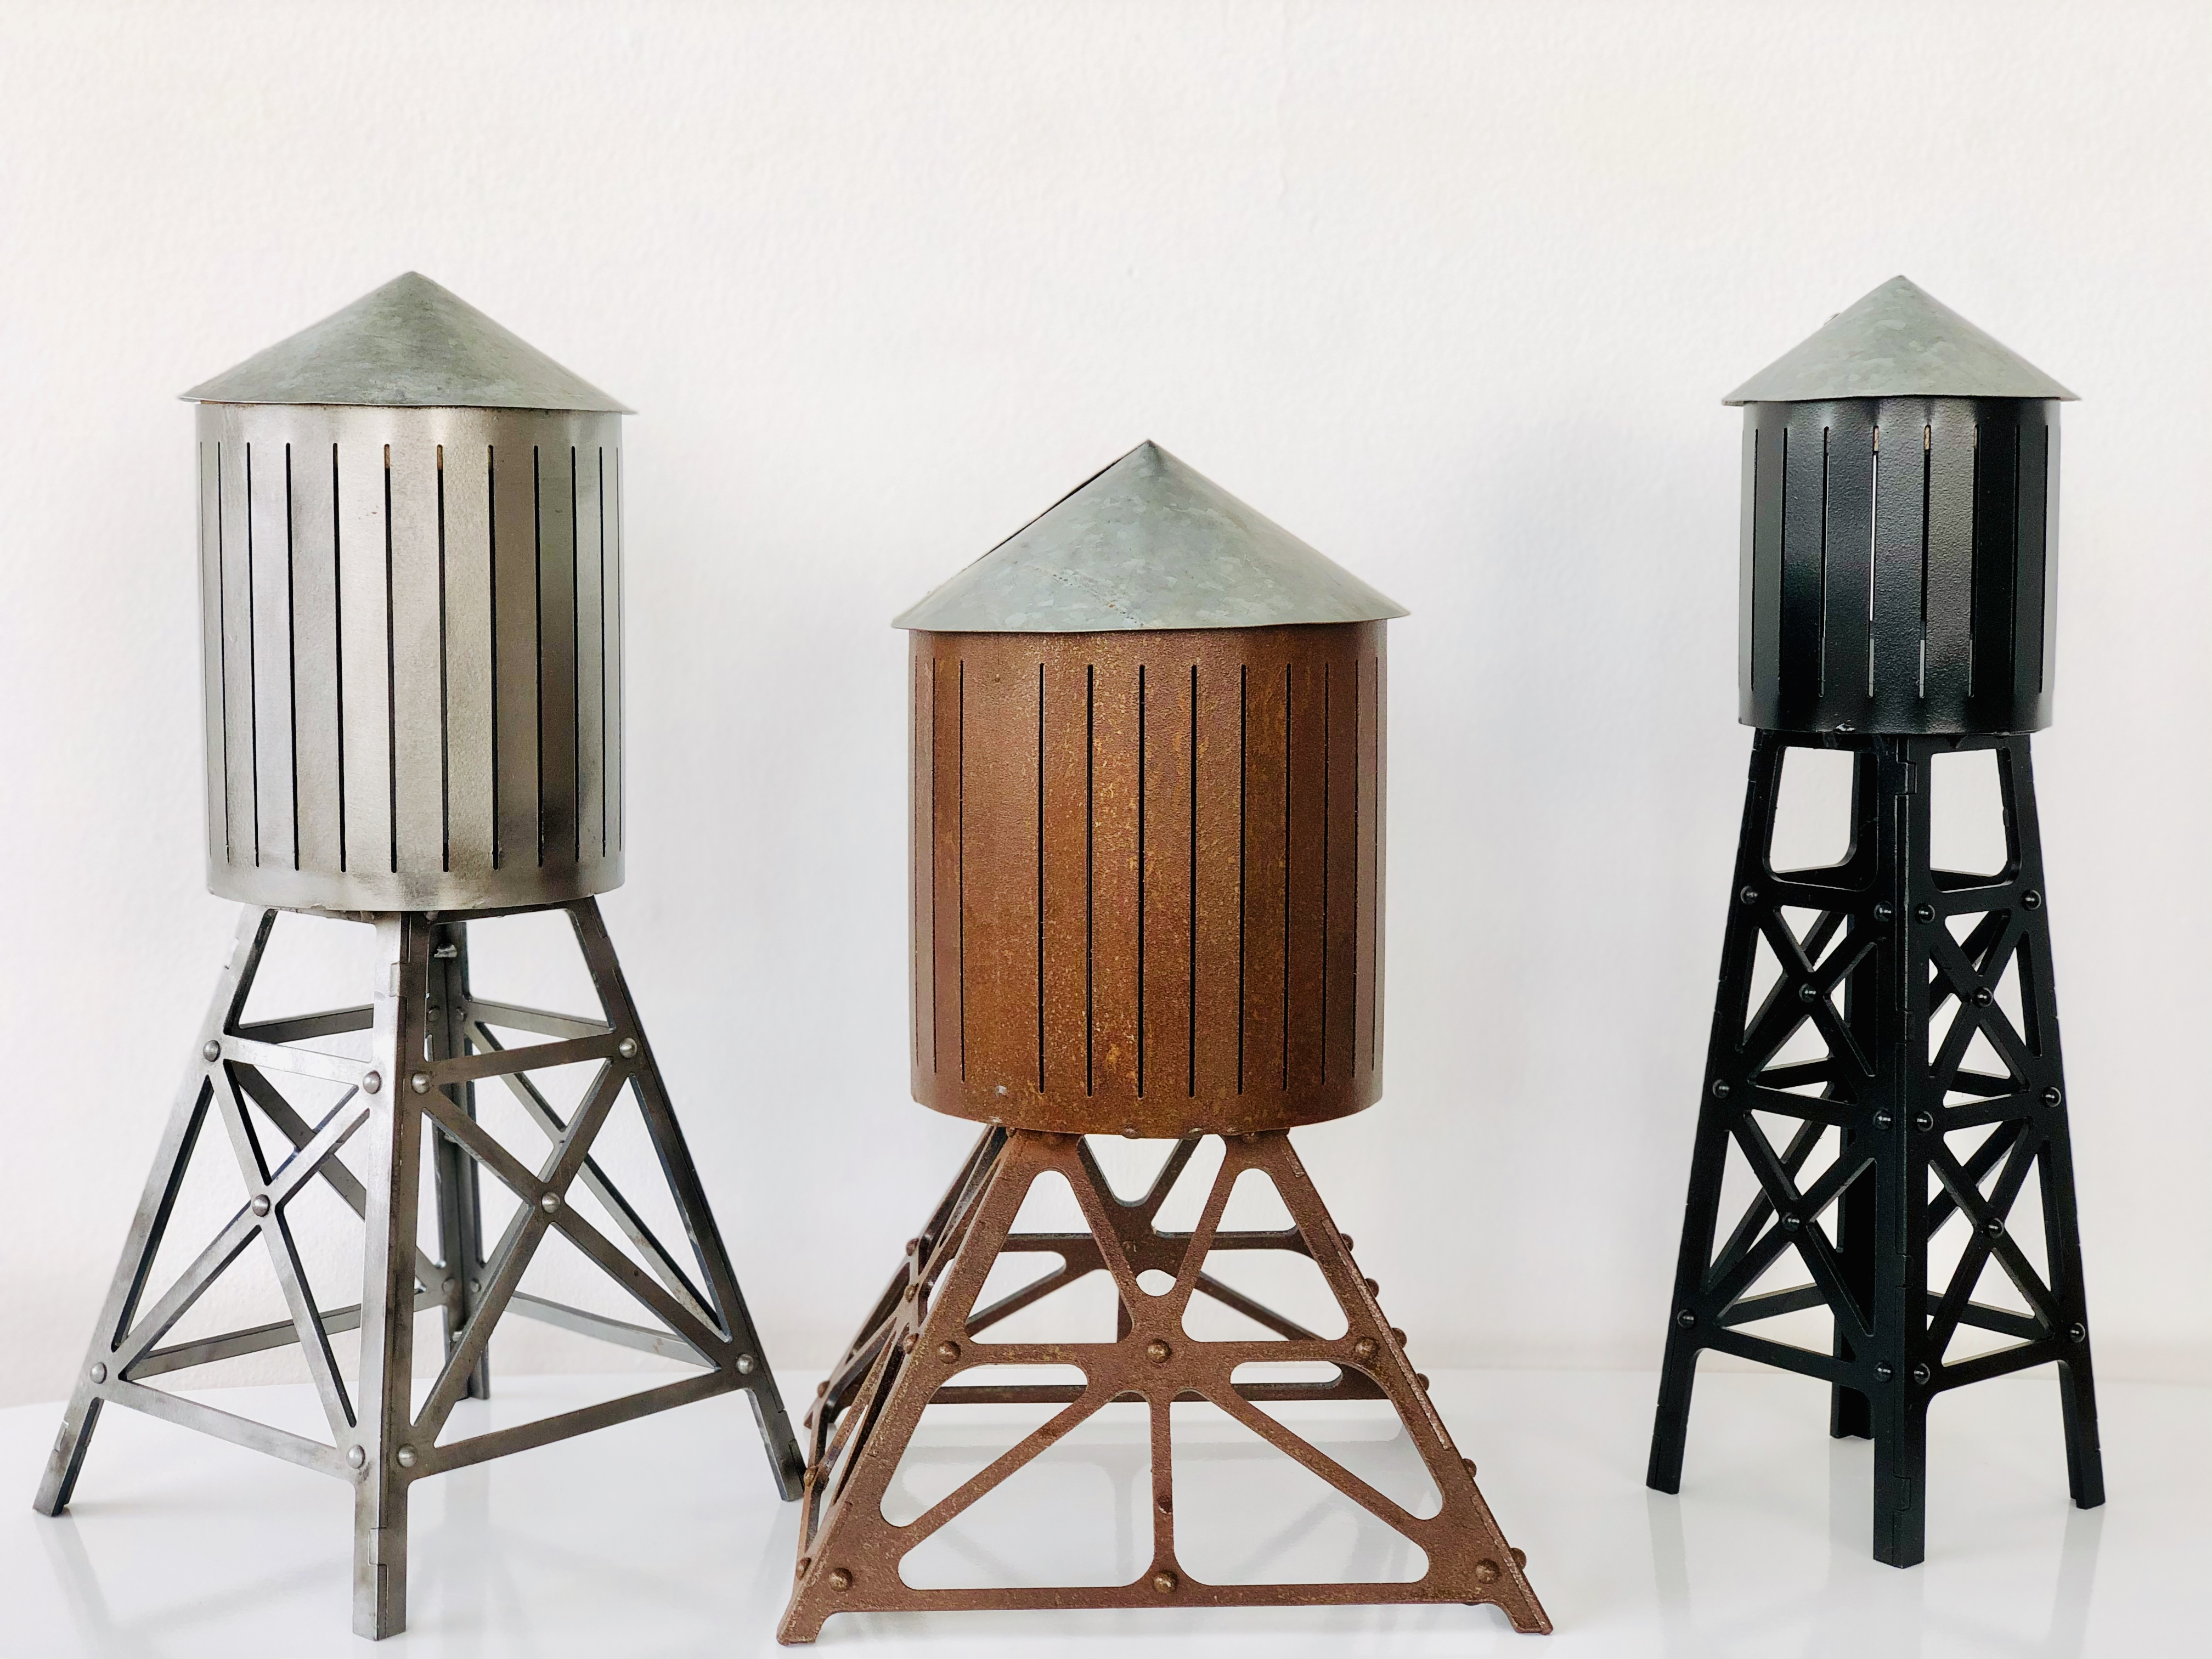 Mini water towers